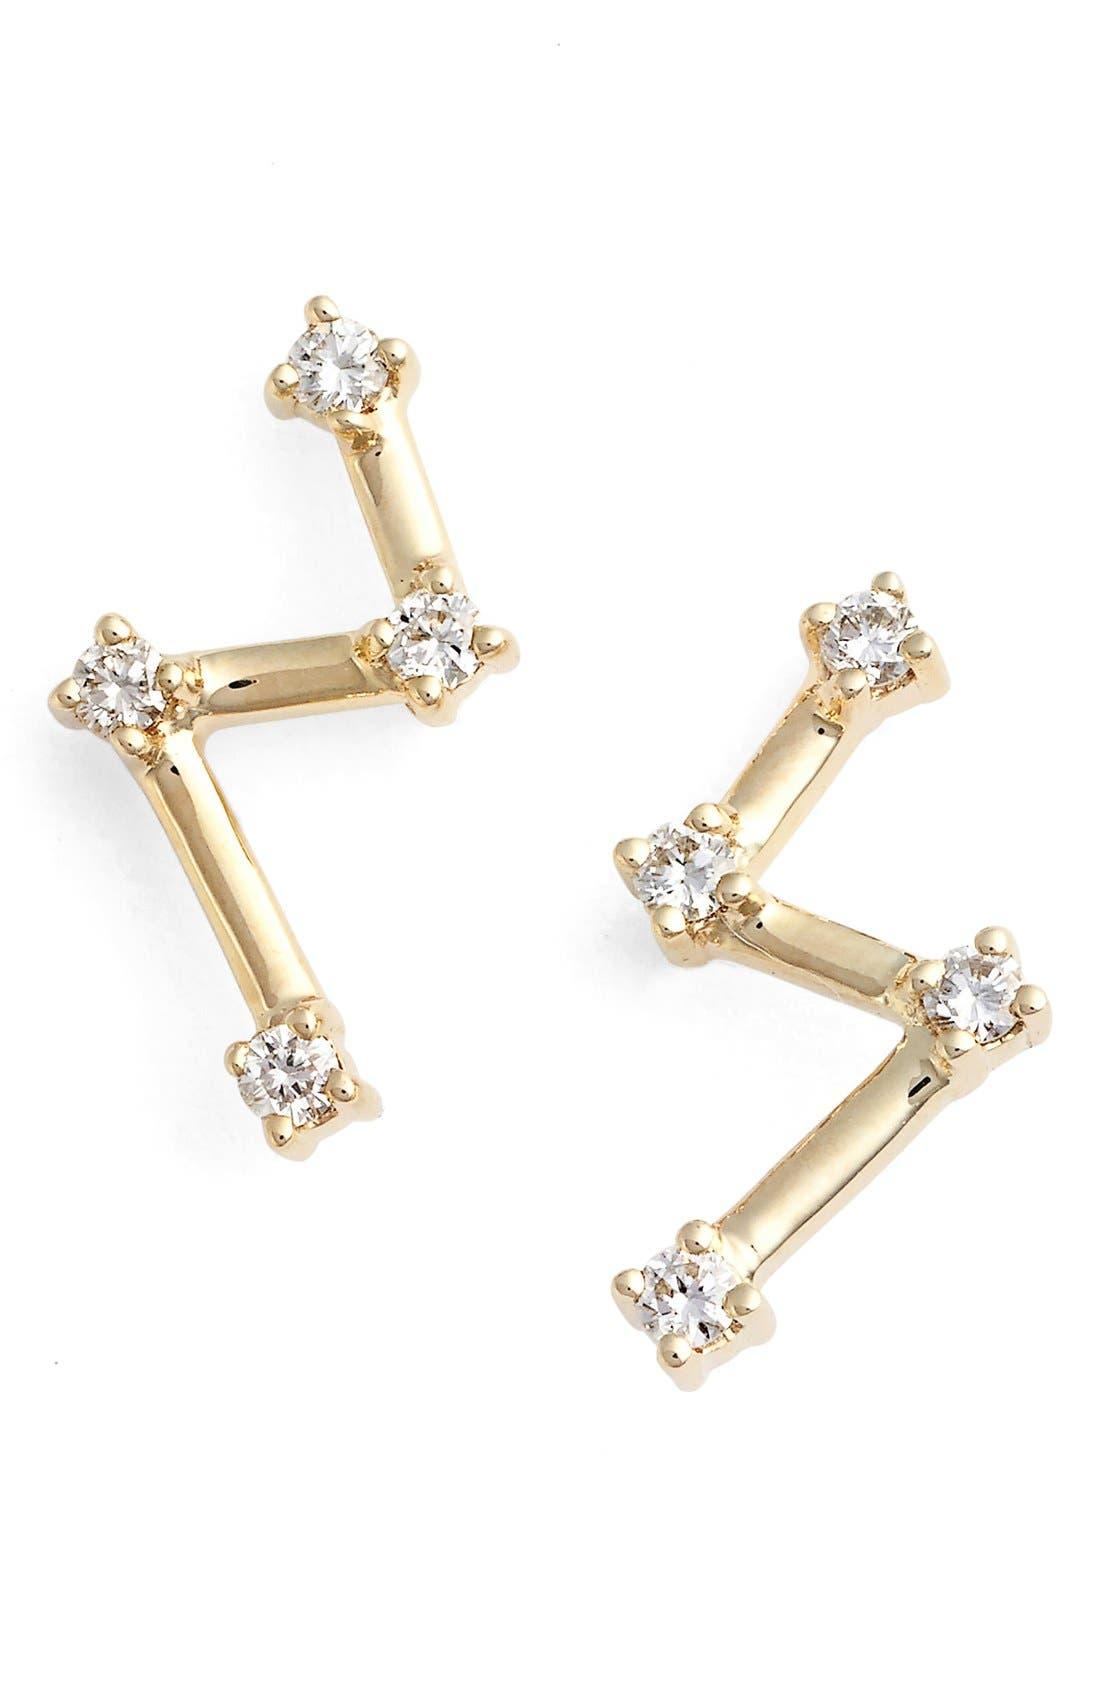 Alternate Image 1 Selected - Dana Rebecca Designs 'Jenna Morgan Zig Zag' Diamond Ear Crawlers